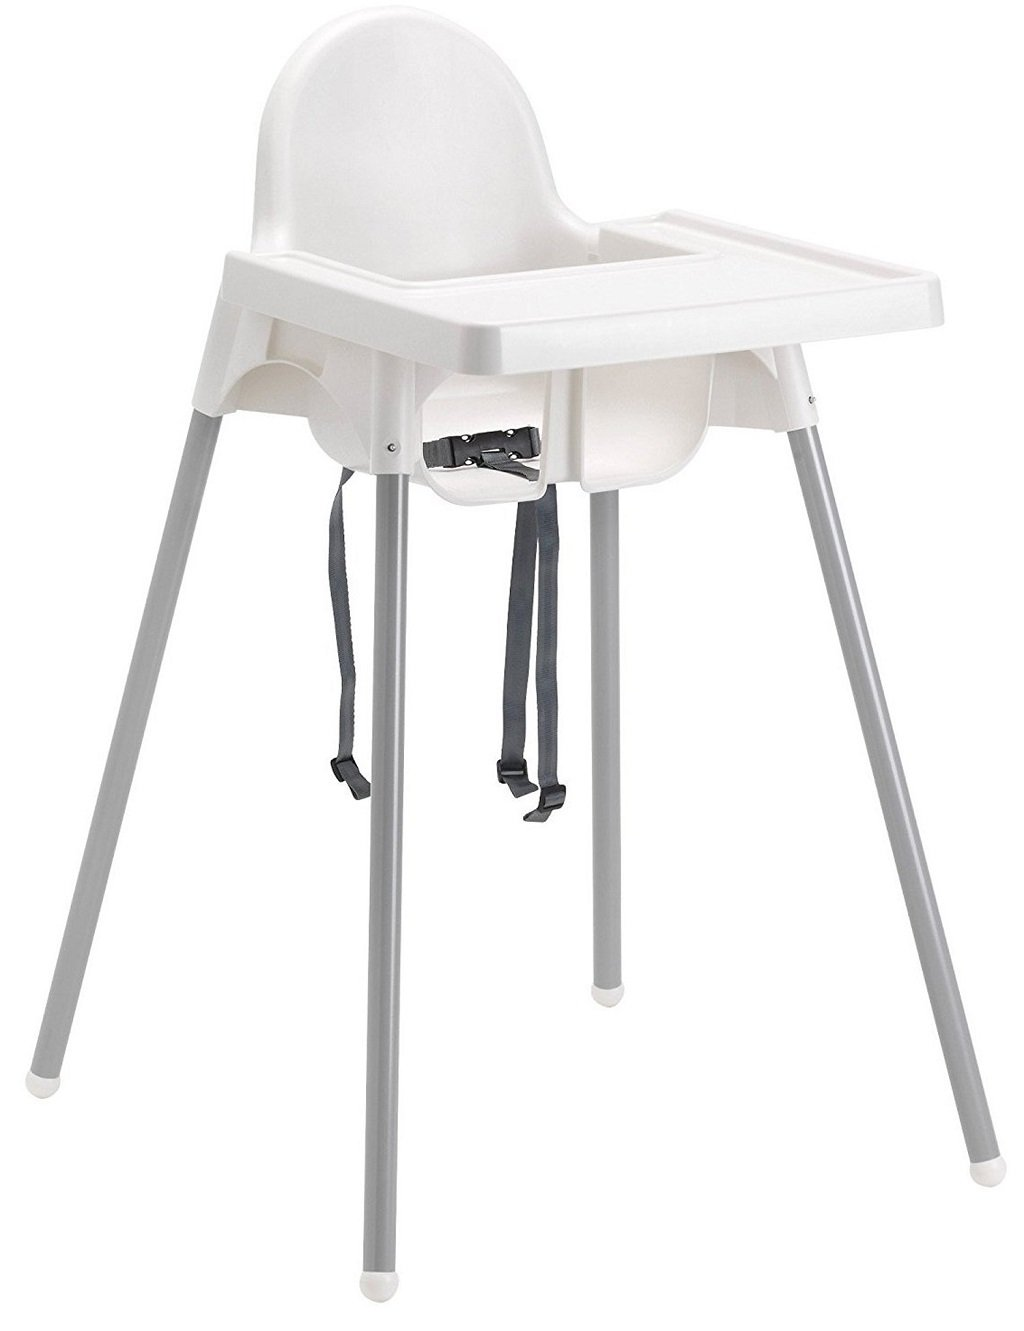 Enjoyable Amazon Com Ikea Antilop Highchair Seat Covers Cushion By Short Links Chair Design For Home Short Linksinfo